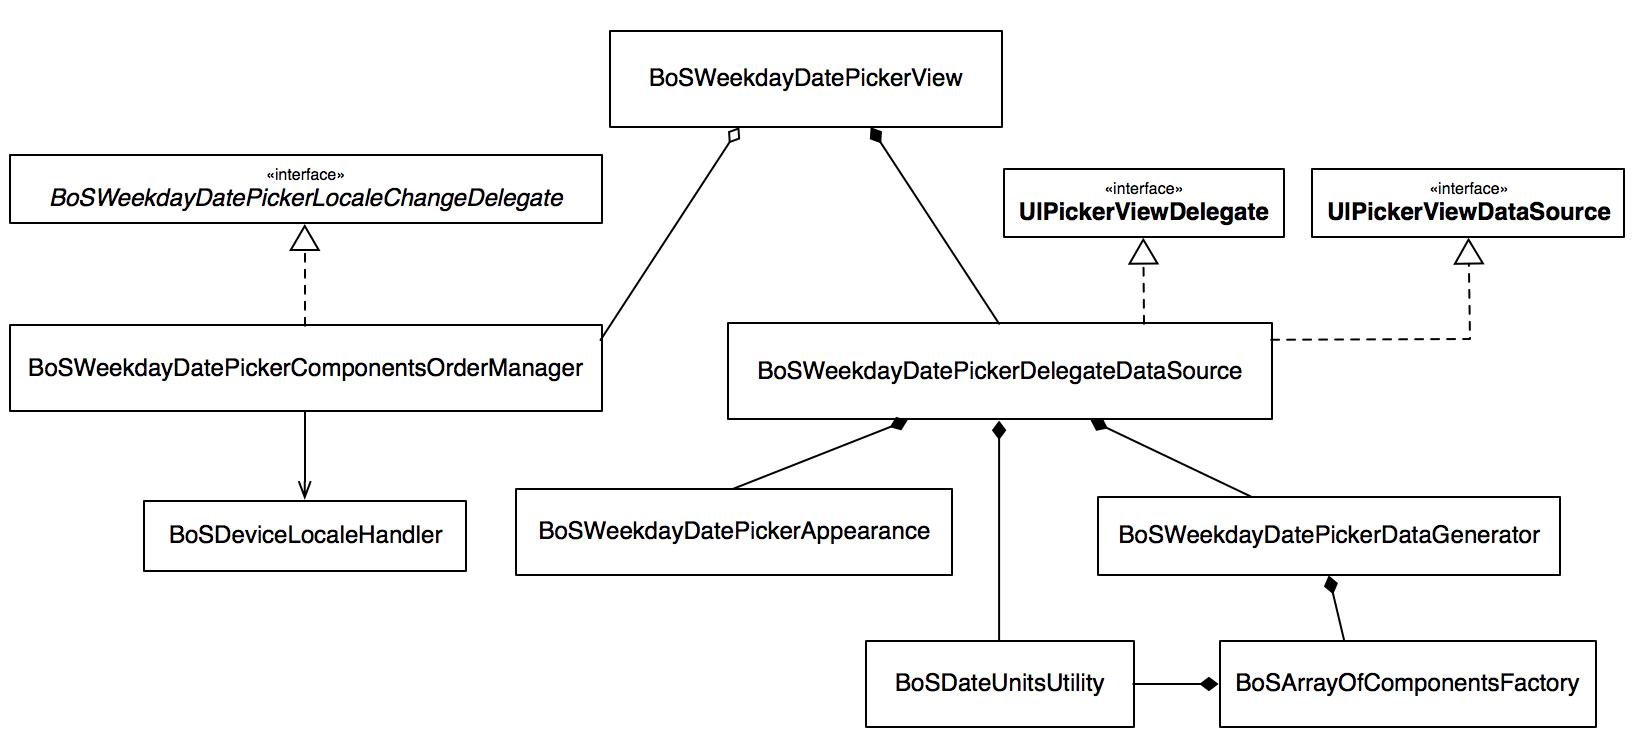 Class diagram image